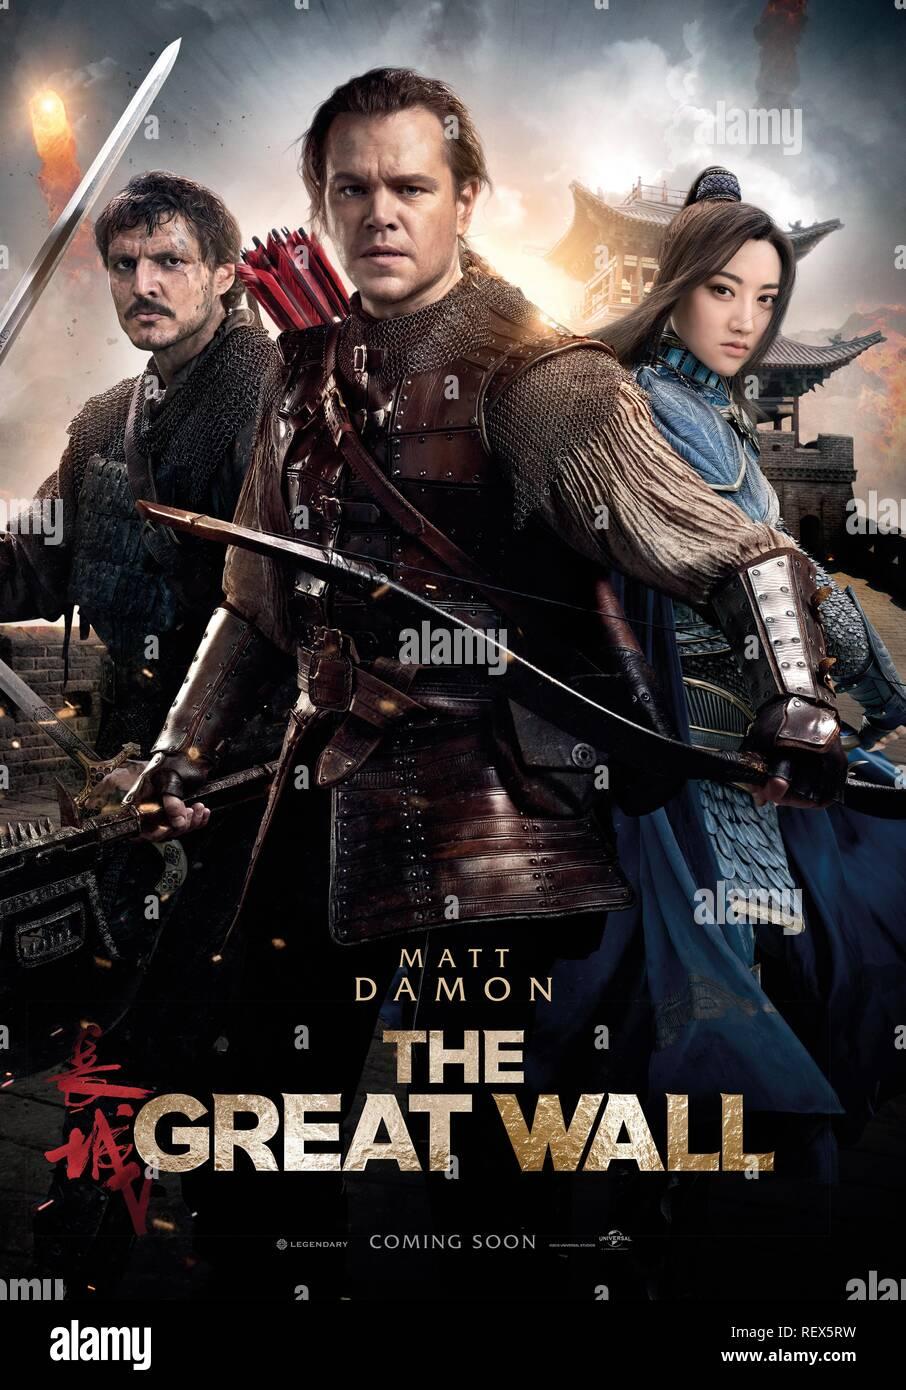 Pedro Pascal Matt Damon Tian Jing Poster The Great Wall 2016 Stock Photo Alamy